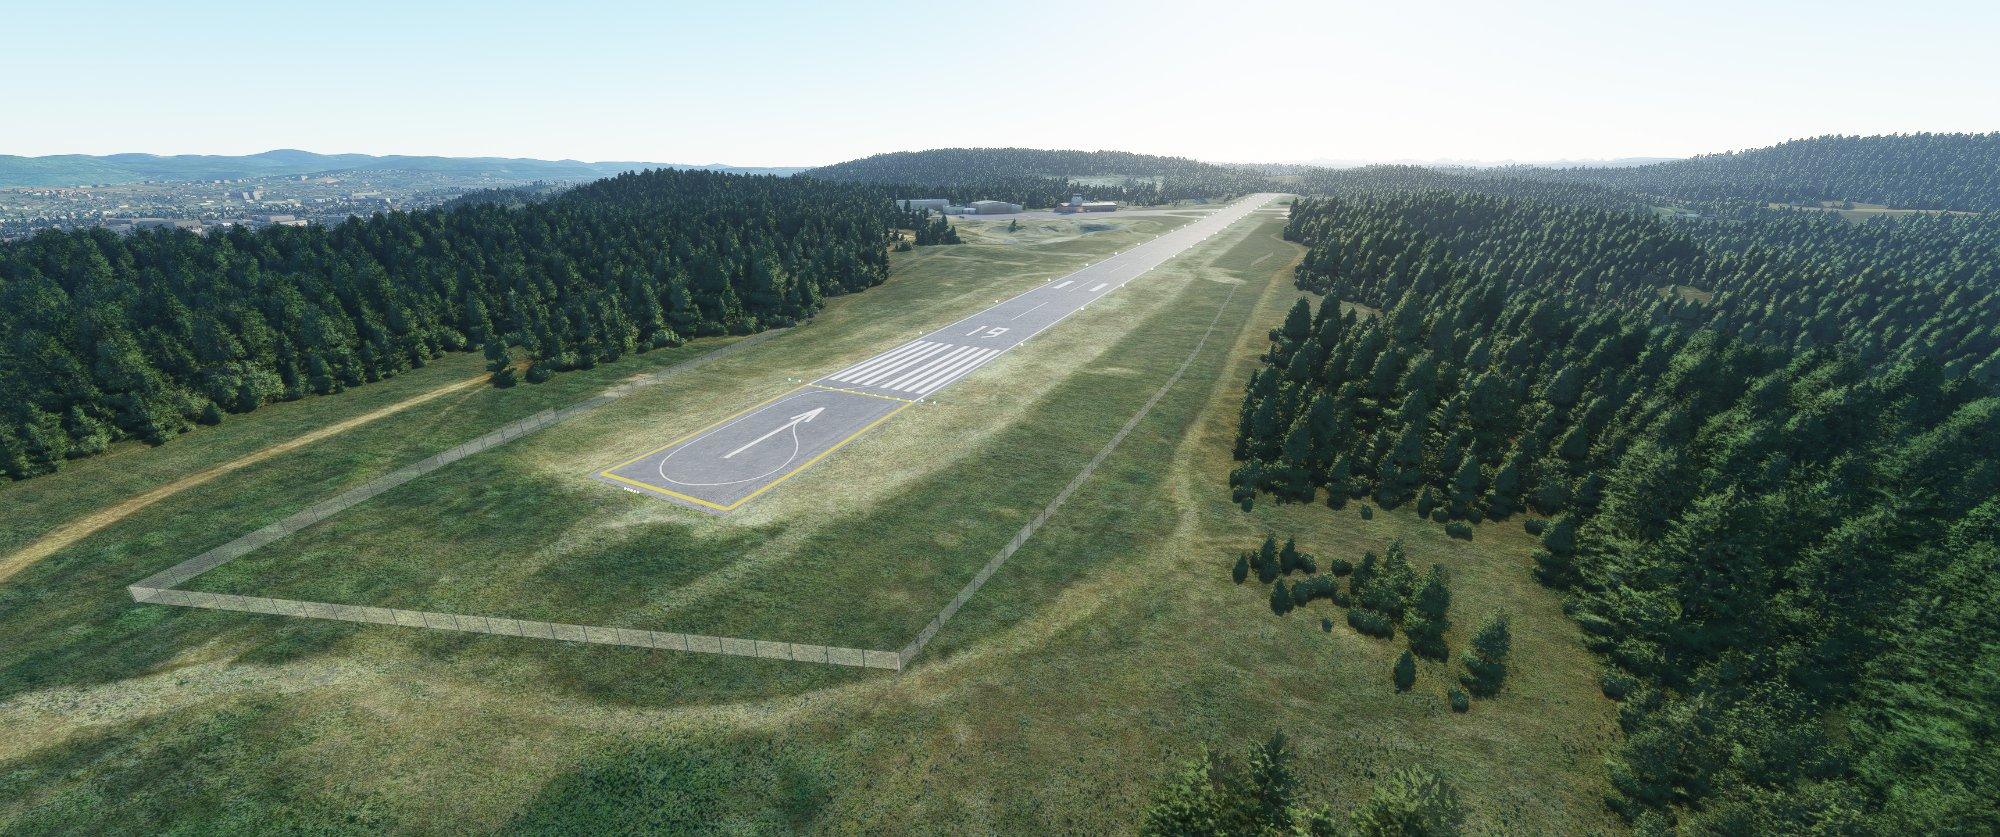 Microsoft Flight Simulator Screenshot 2020.10.30 - 16.26.35.97.jpg